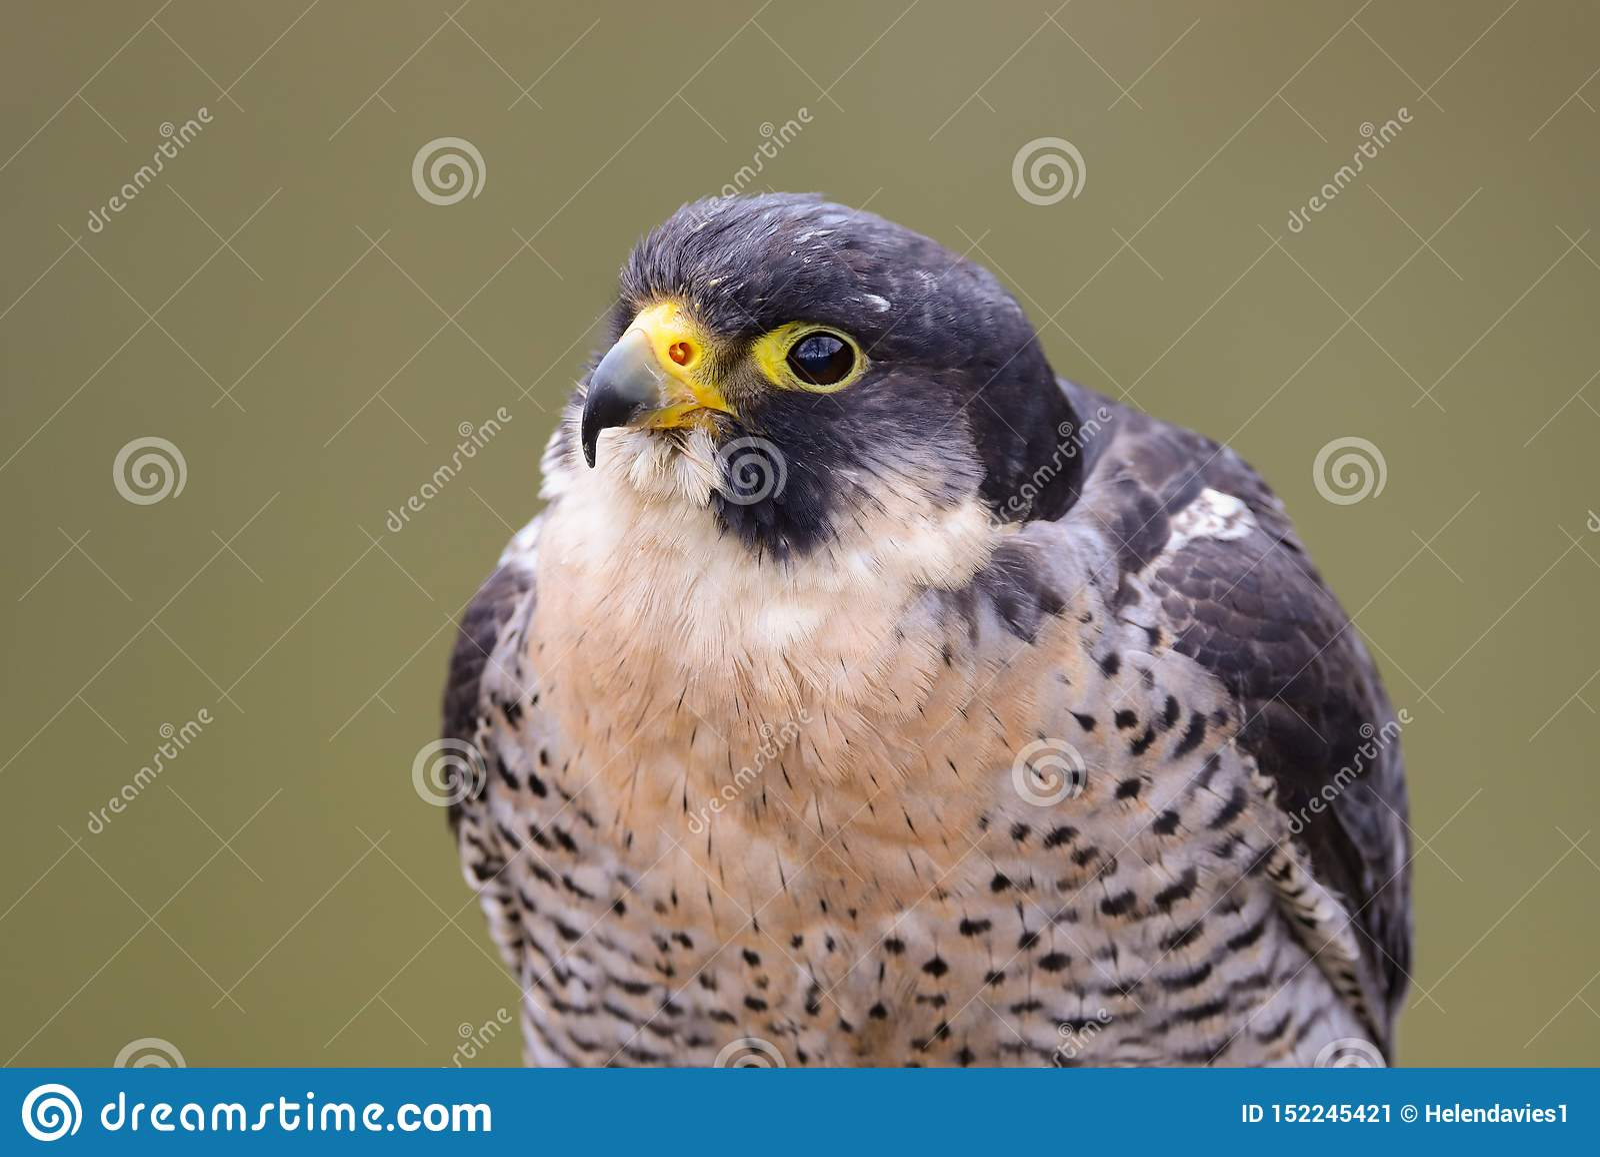 Peregrine Falcon Falco peregrinus bird of prey